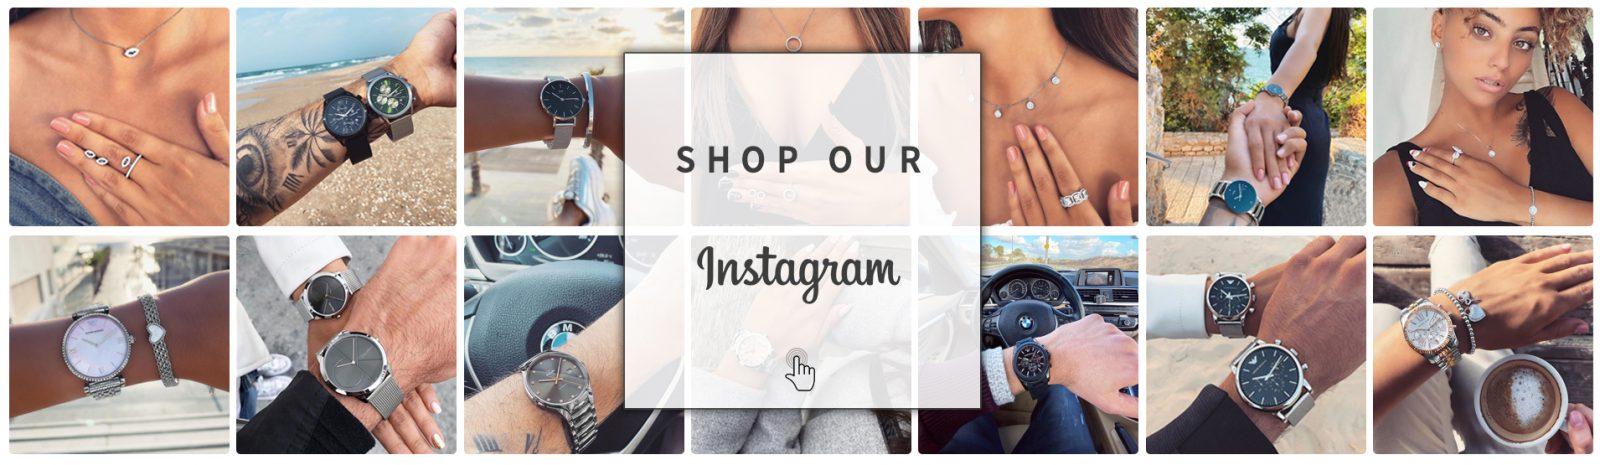 shop-our-instagram-באנר-ספרינג